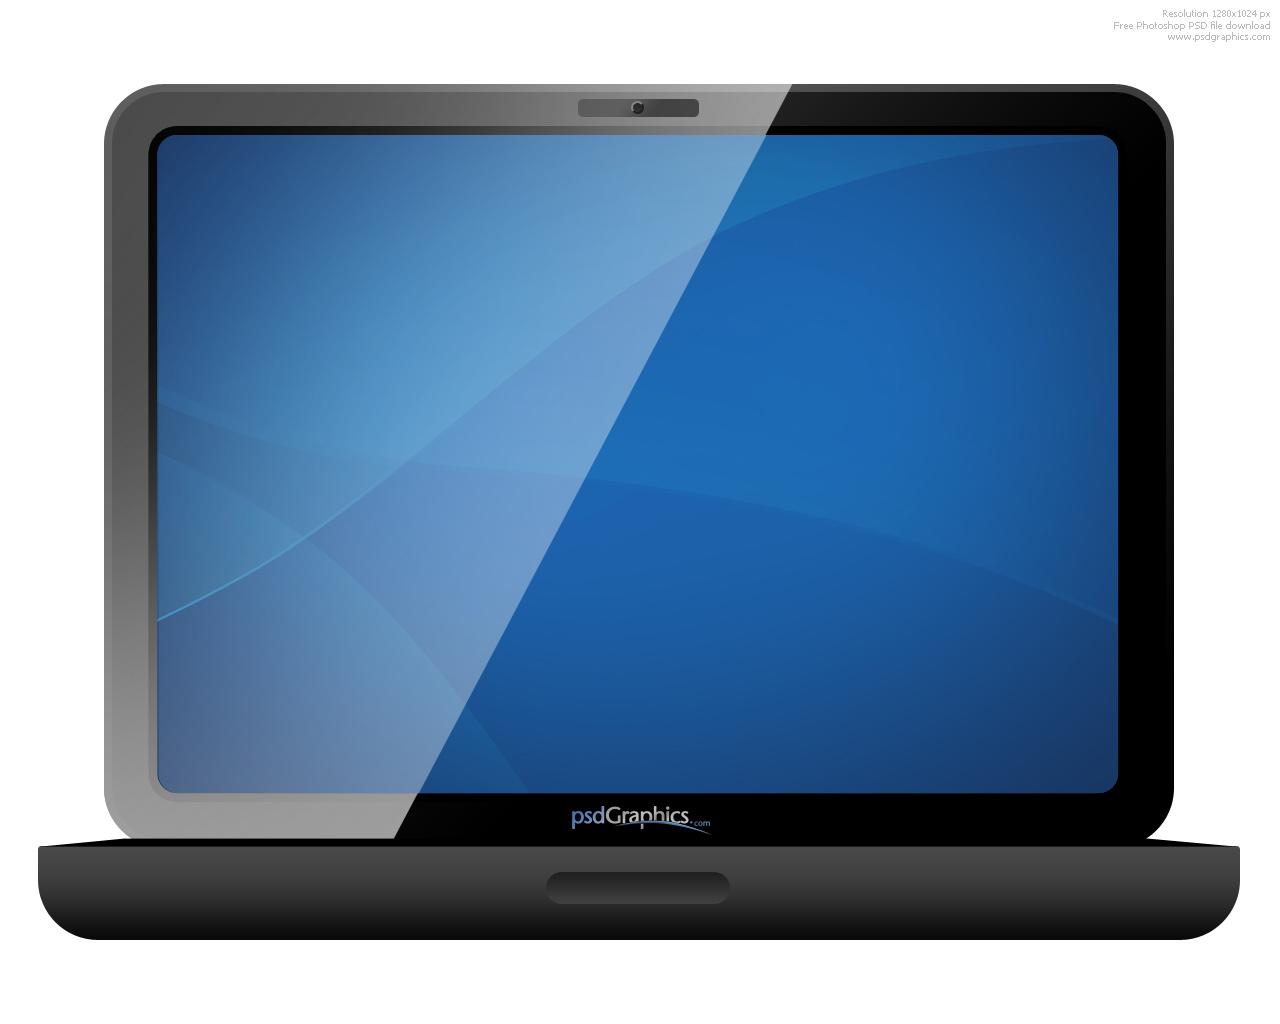 http://2.bp.blogspot.com/-F_nNRSXdkOo/T13oihBU9CI/AAAAAAAAAgM/Si4cvokzBDw/s1600/black-laptop-icon.jpg